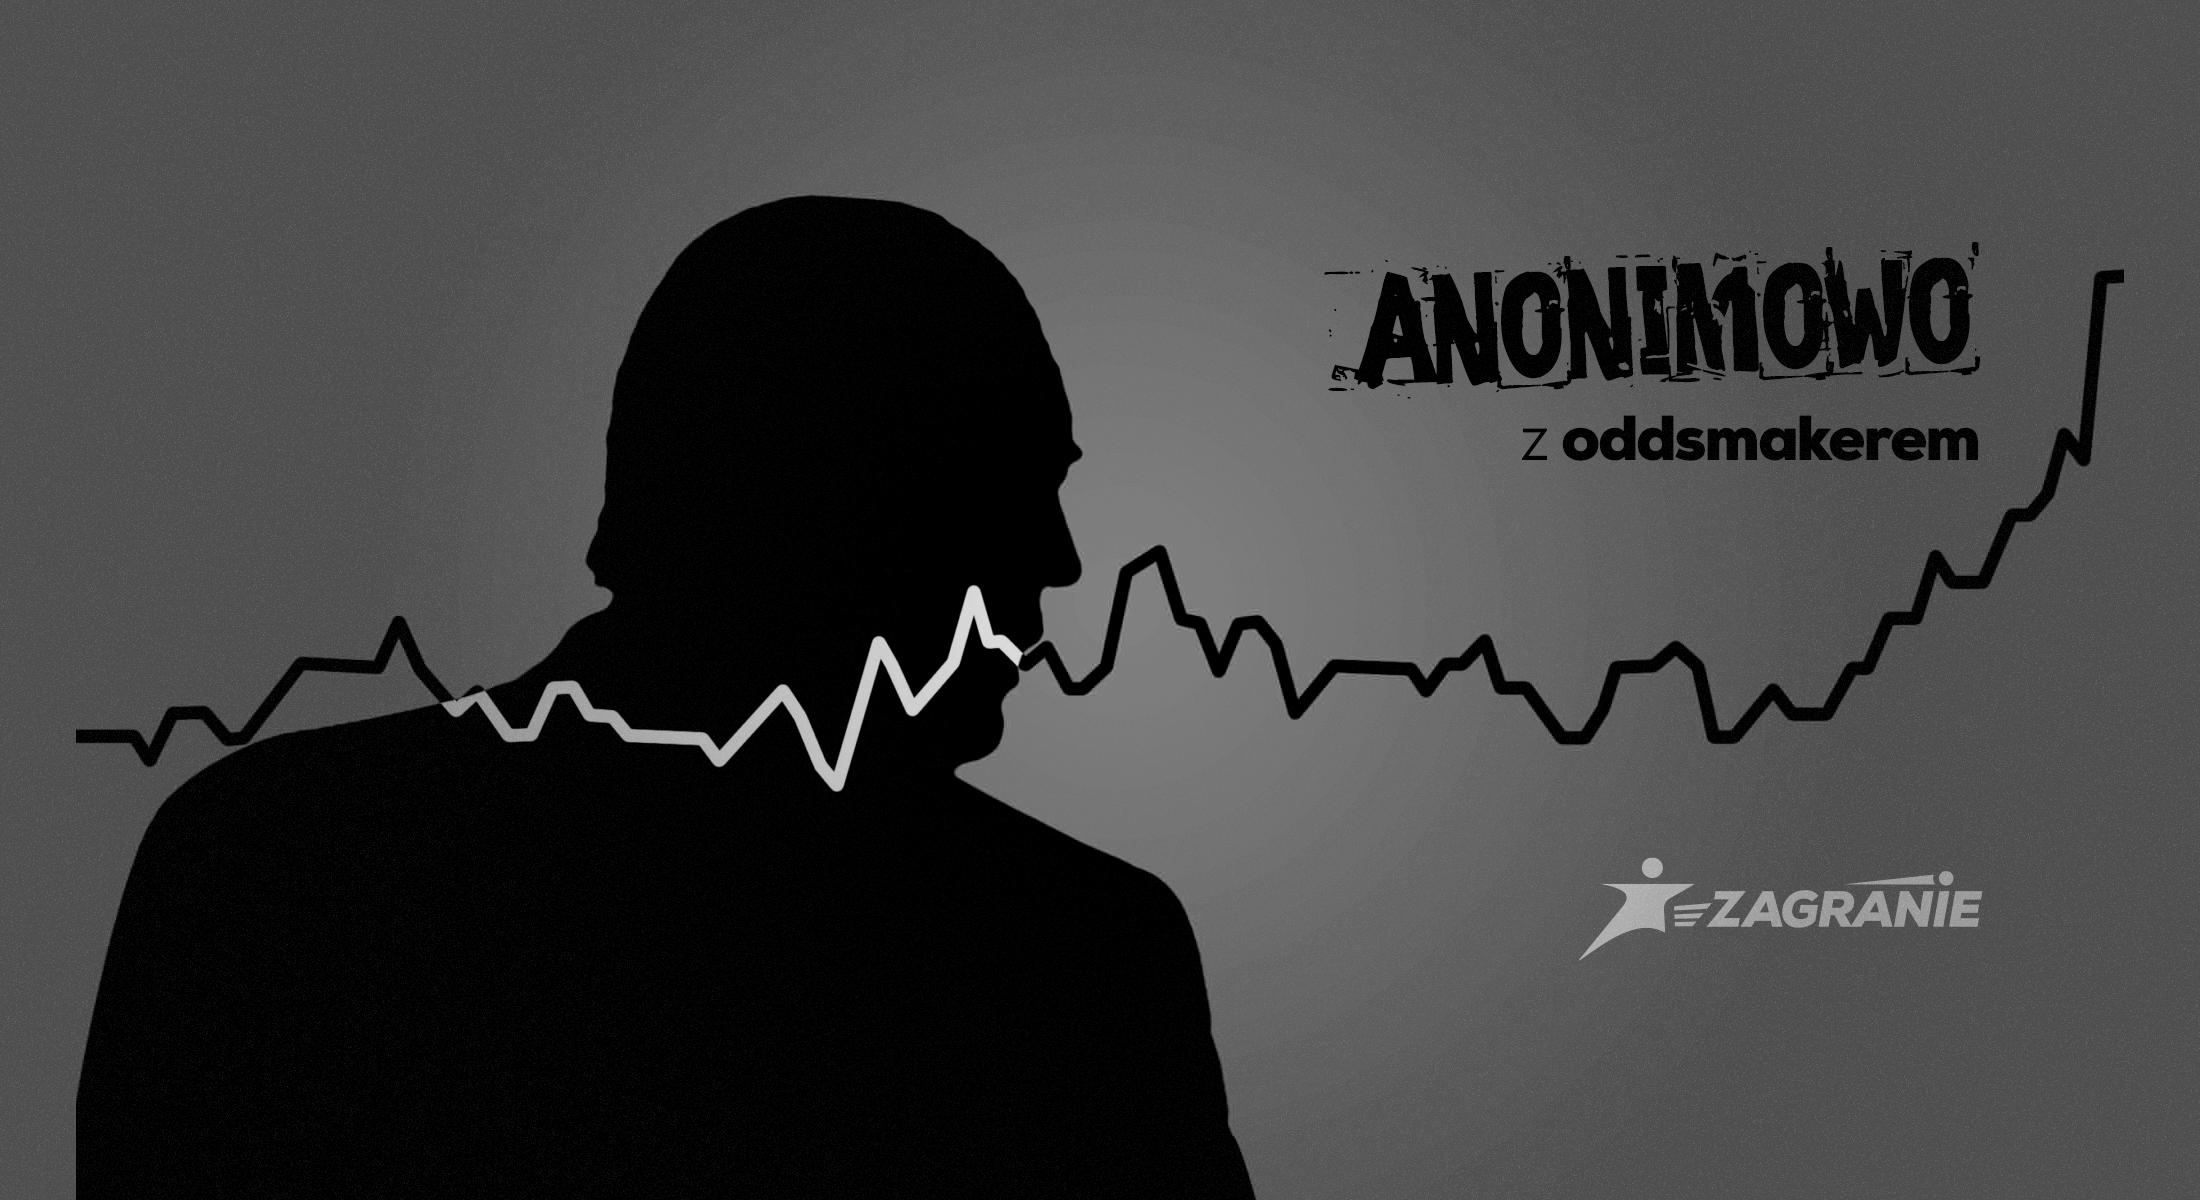 anonimowo z oddsmakerem